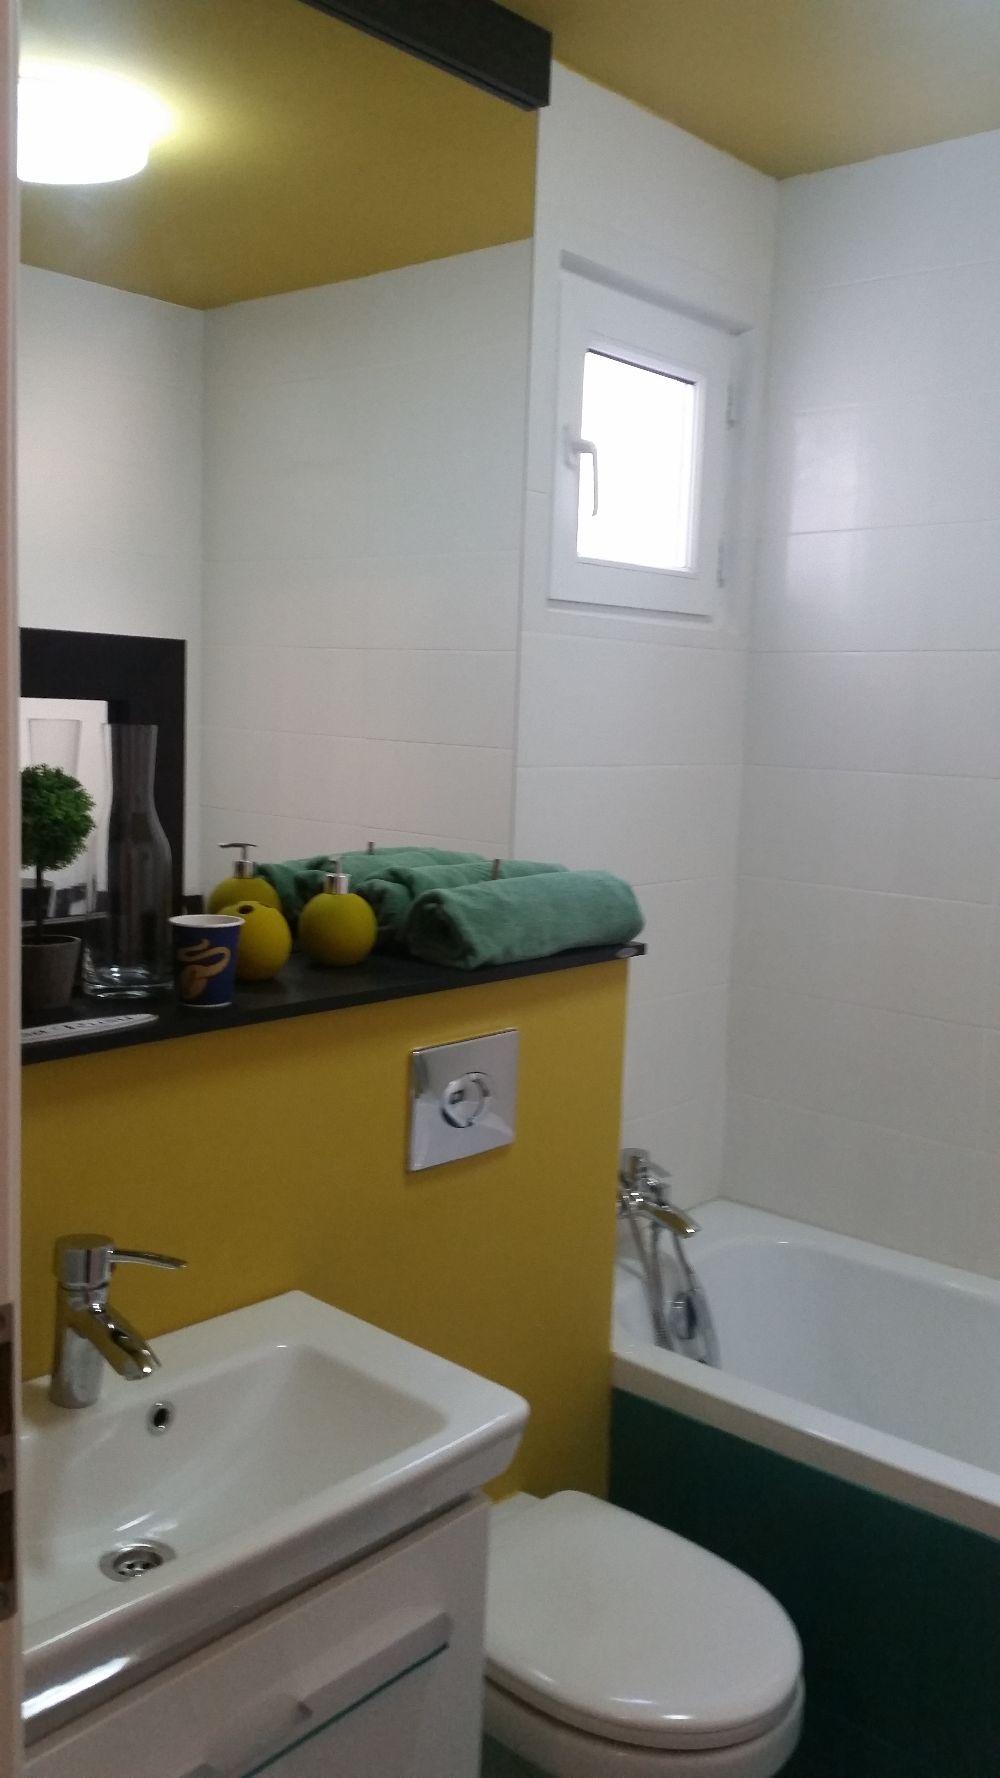 adelaparvu.com despre apartamentul de 2 camere al Adinei Ion, episodul 6, sezonul 2 Visuri la cheie, ProTv (13)